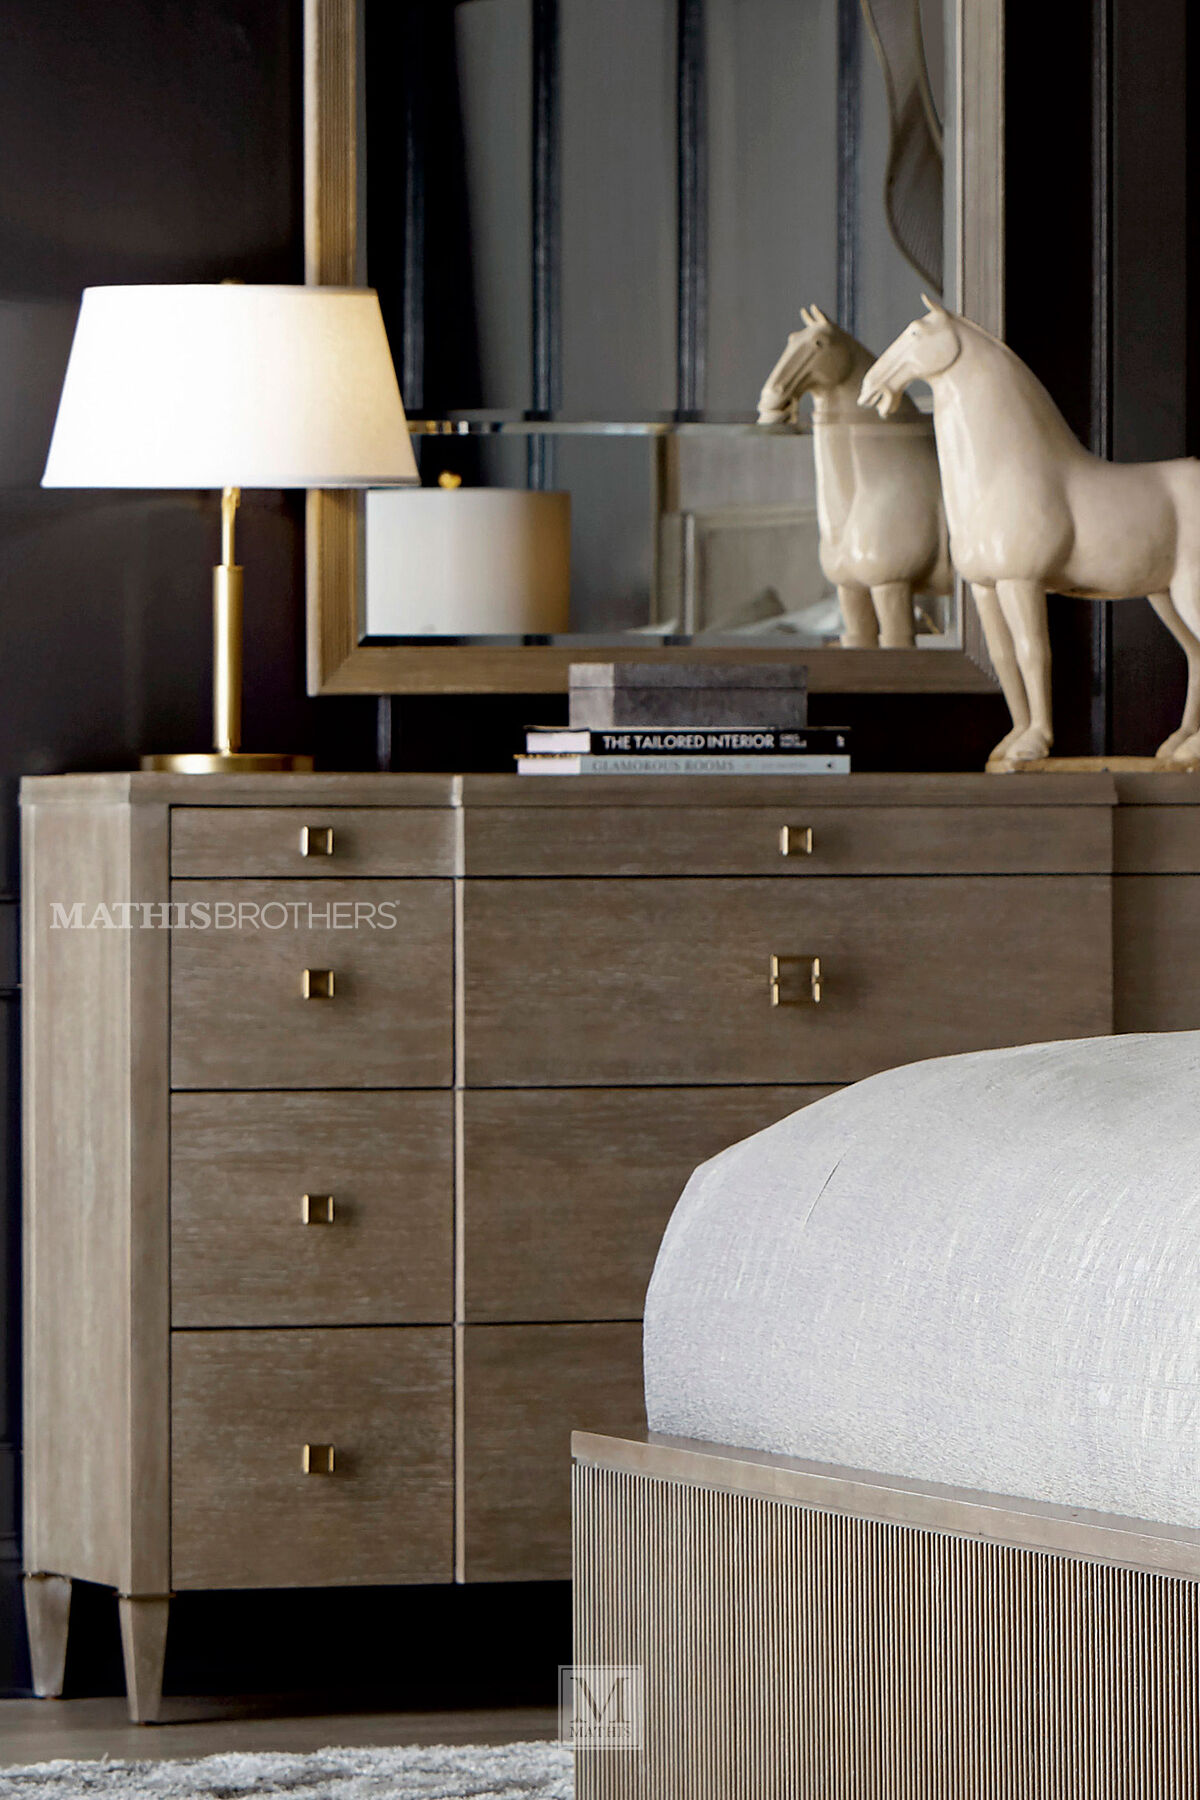 A.R.T. Furniture Cityscapes Ellis Chesser · A.R.T. Furniture Cityscapes  Ellis Chesser